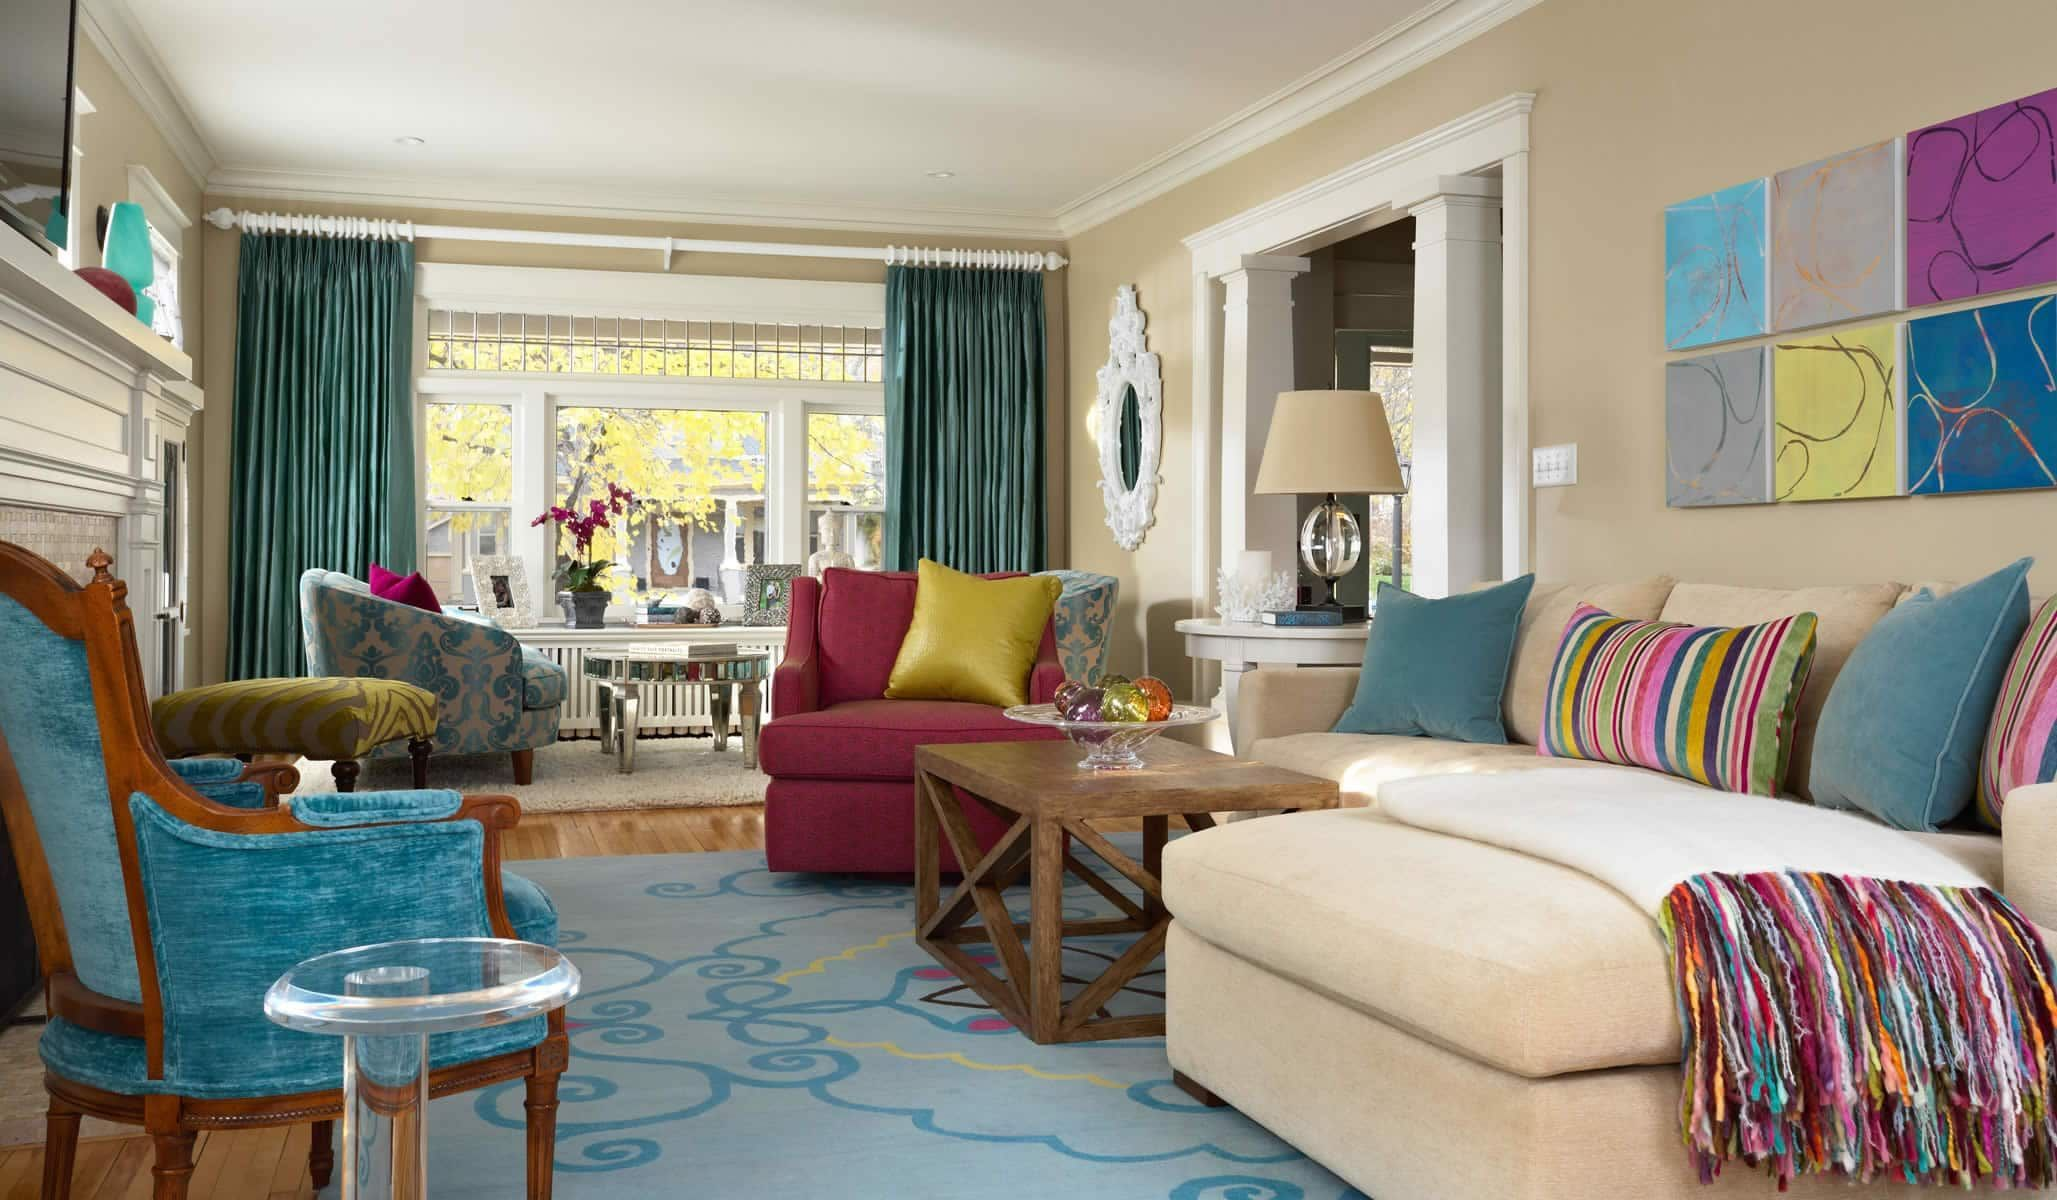 Color Expert Interior Design Minneapolis Mn Lilu Interiors In 2021 Beige Living Room Decor Beige Living Rooms Pretty Living Room